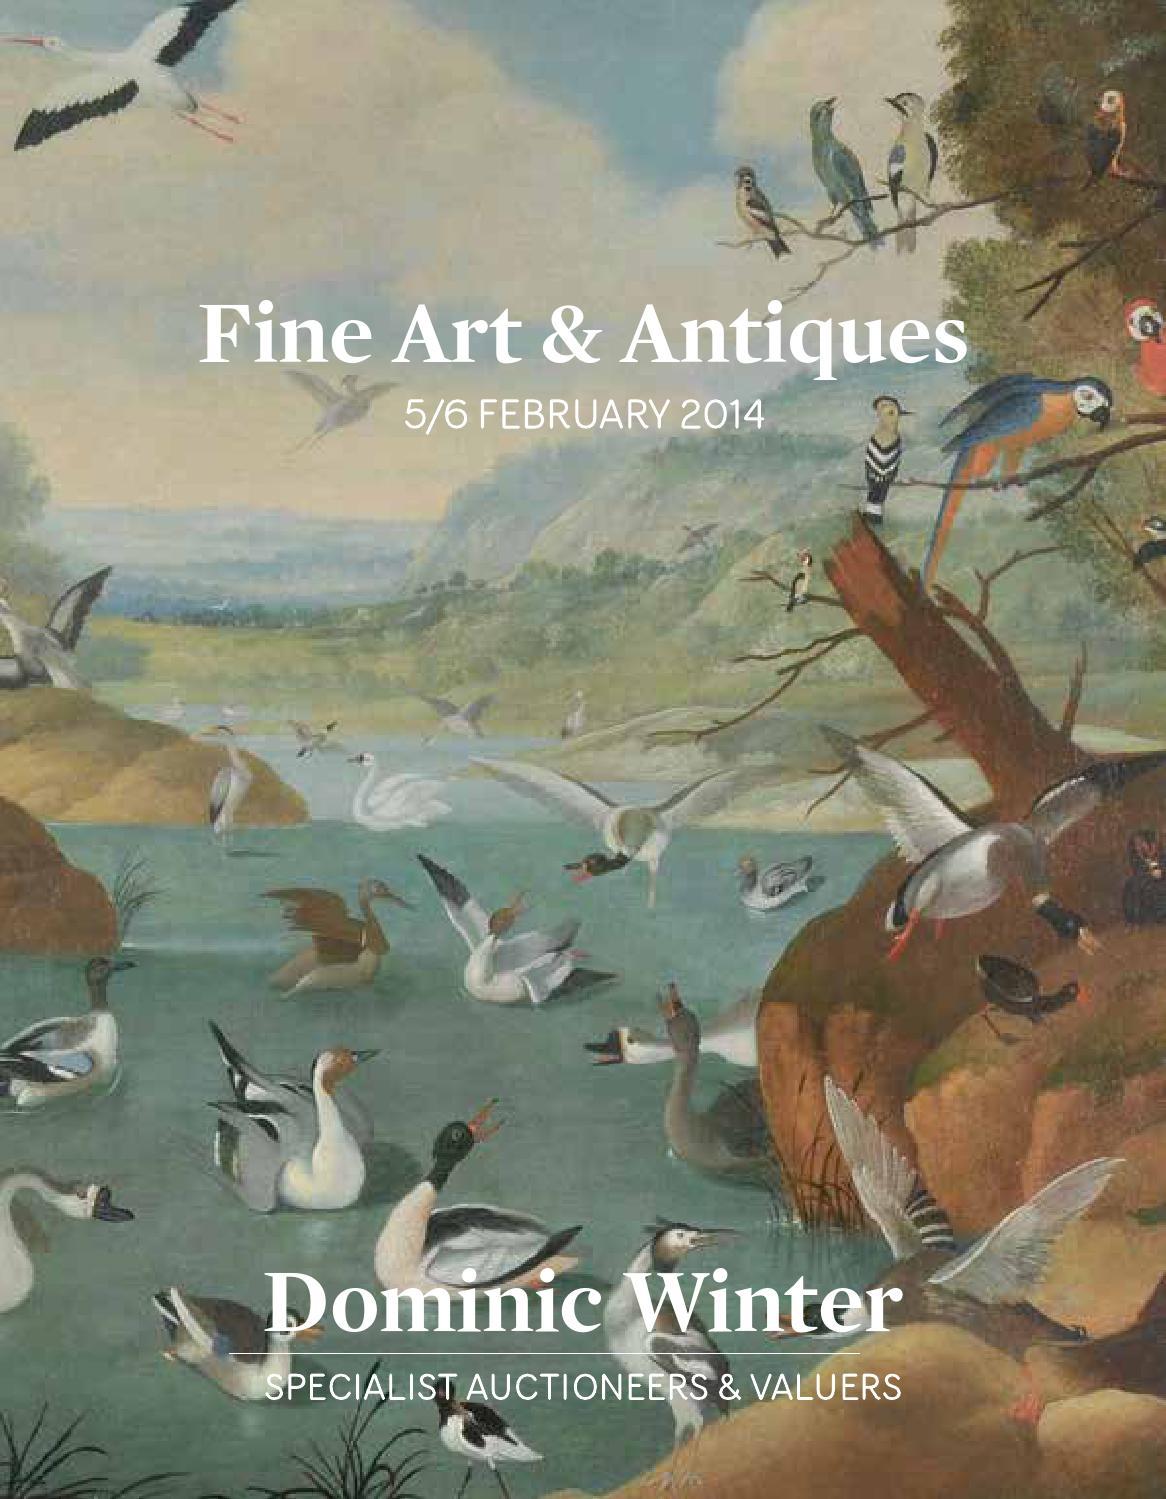 0a40f92710d Dominic Winter by Jamm Design Ltd - issuu